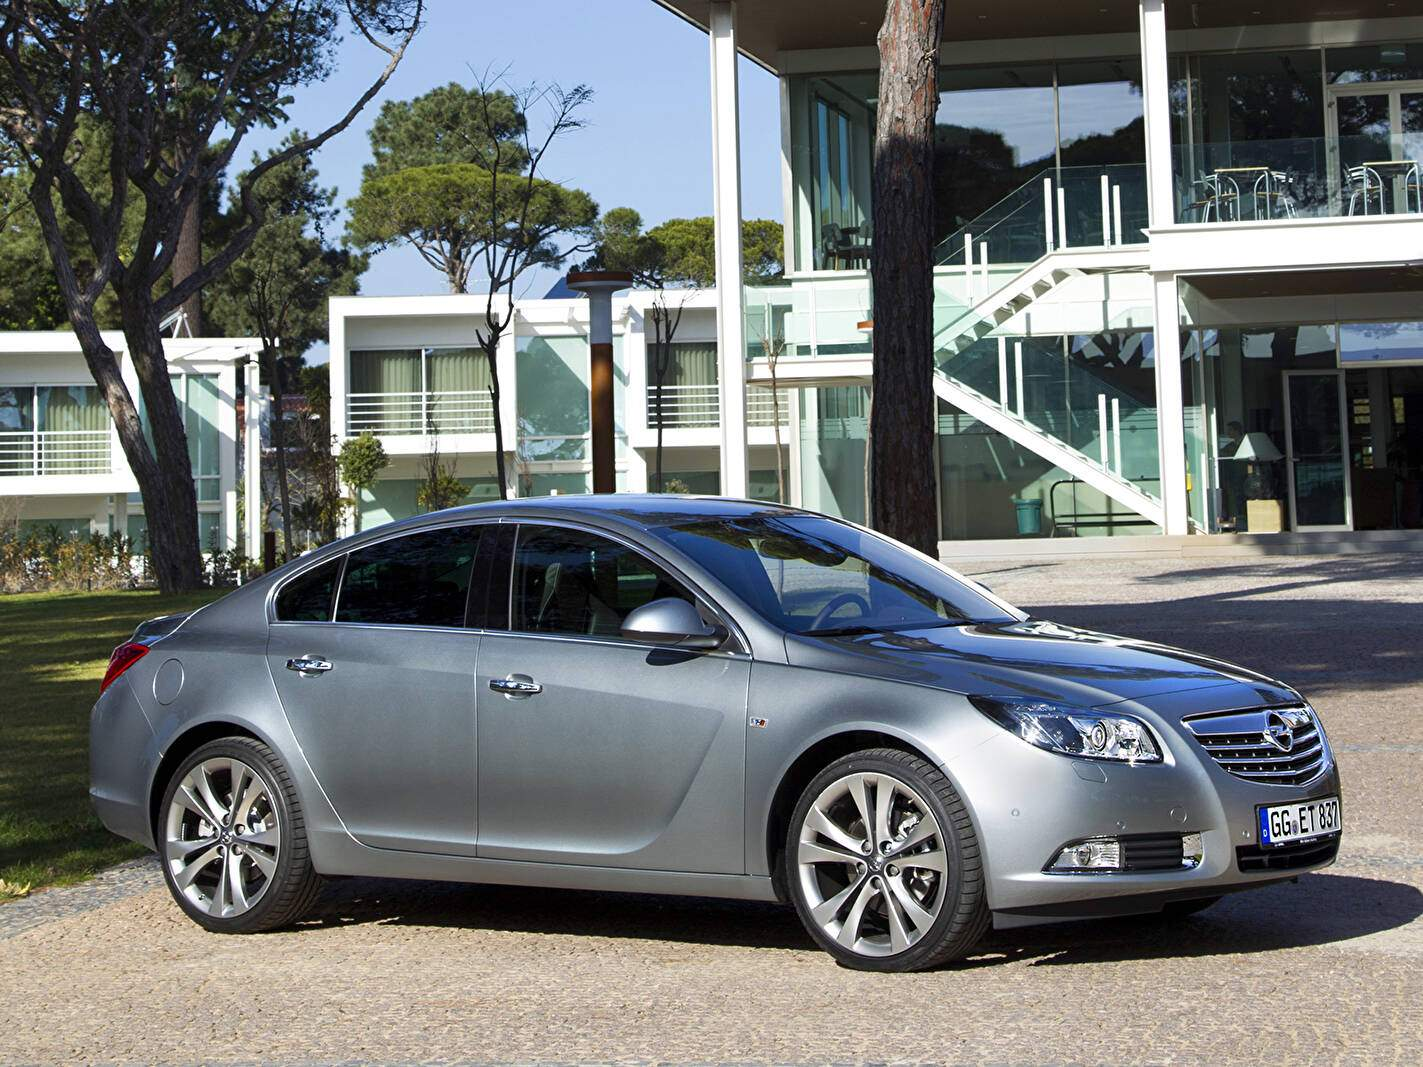 Opel Insignia 2.0 CDTi BiTurbo 195 (2011-2015),  ajouté par fox58